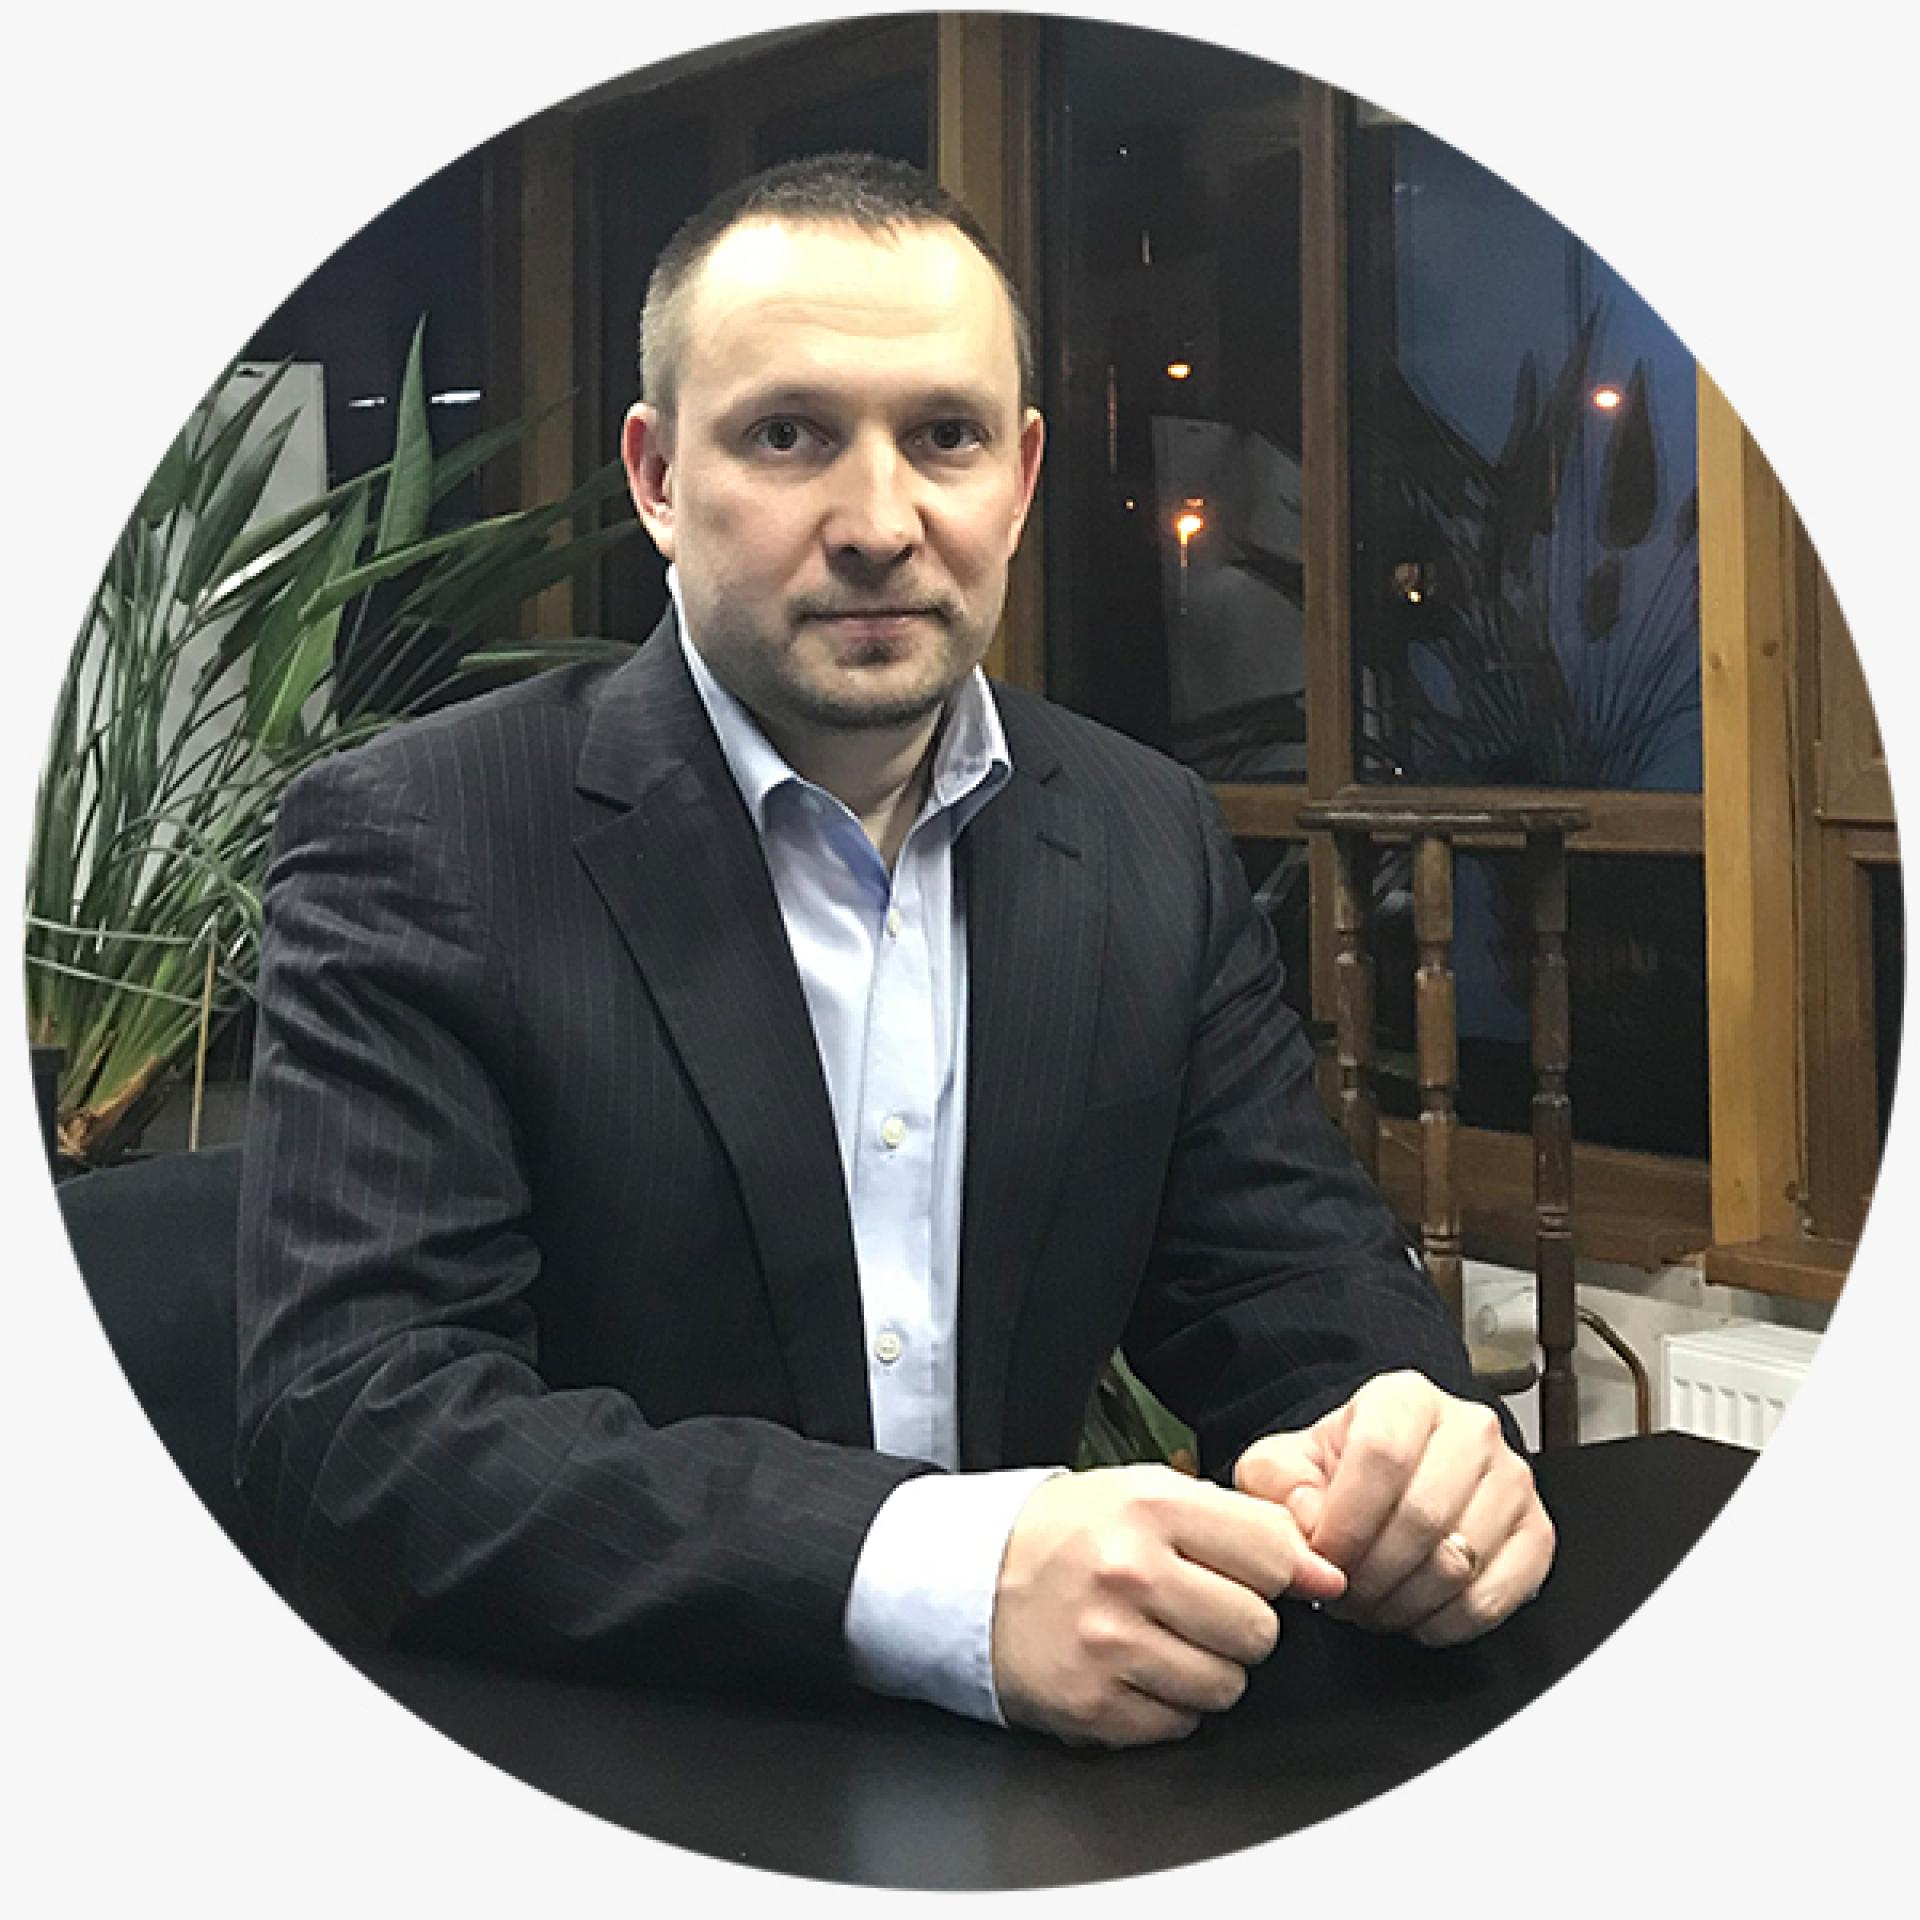 Pavel Hlavička